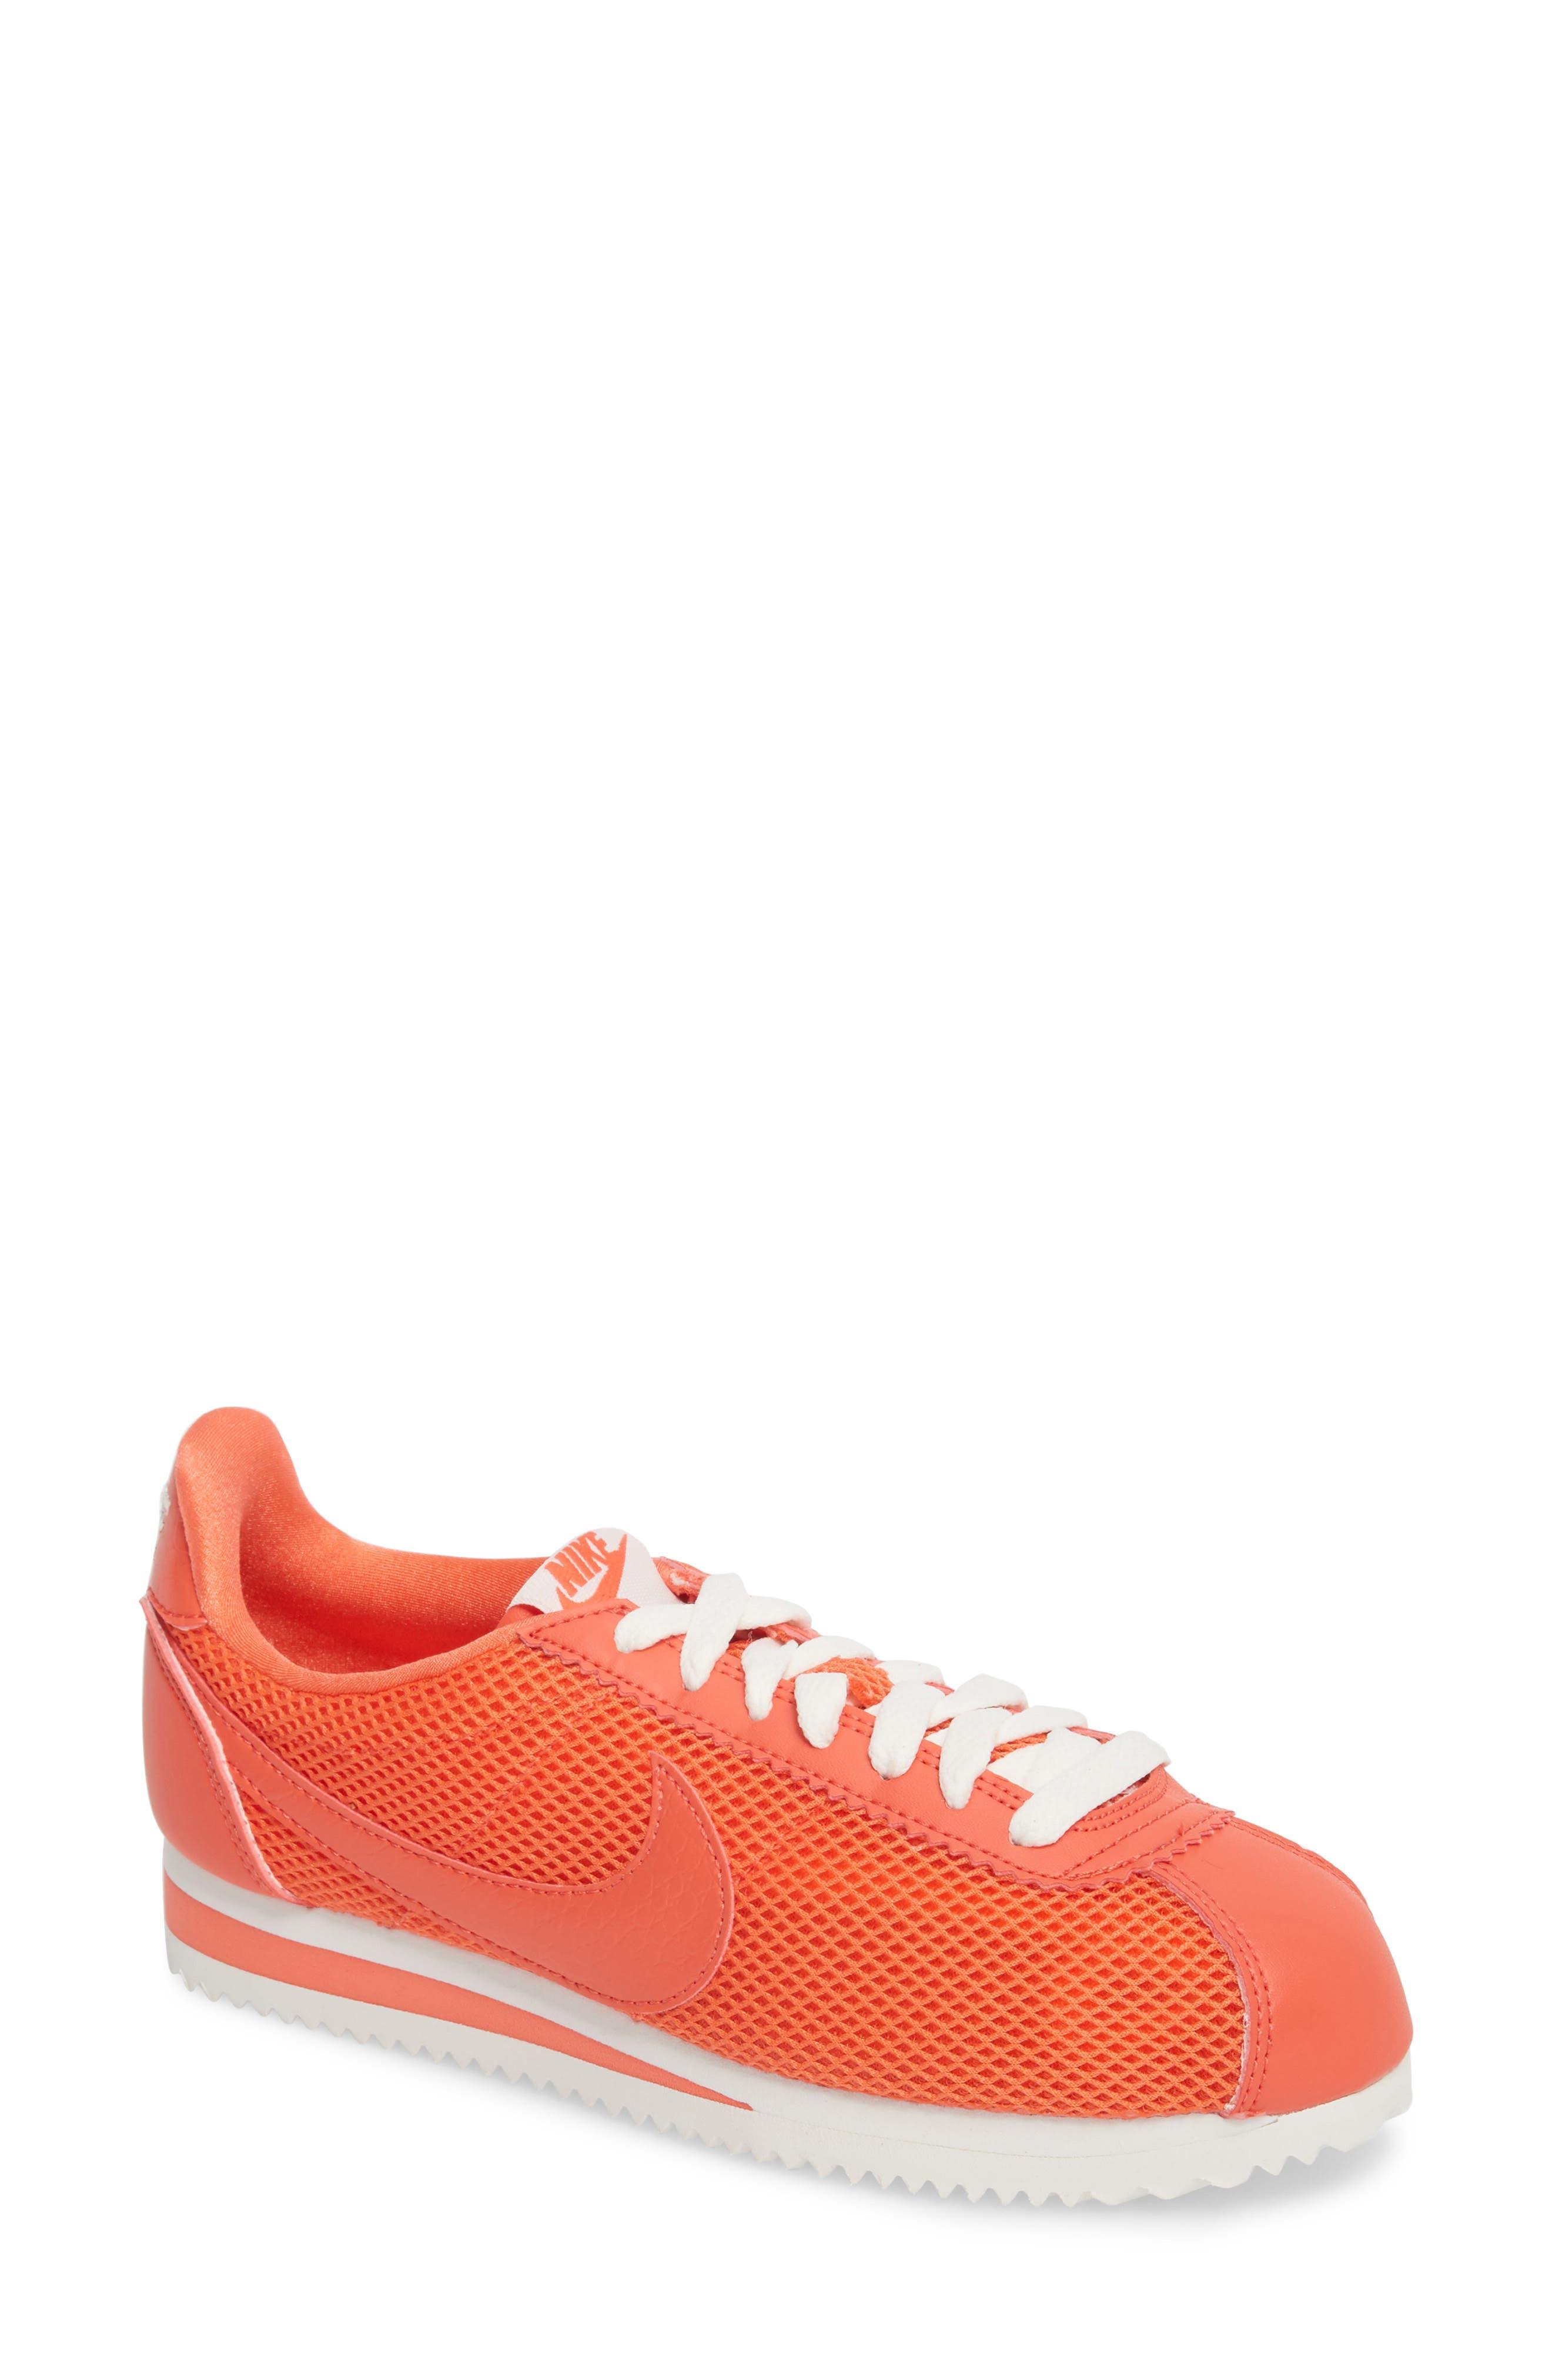 Classic Cortez Premium Sneaker,                             Main thumbnail 1, color,                             Rush Coral/ Summit White